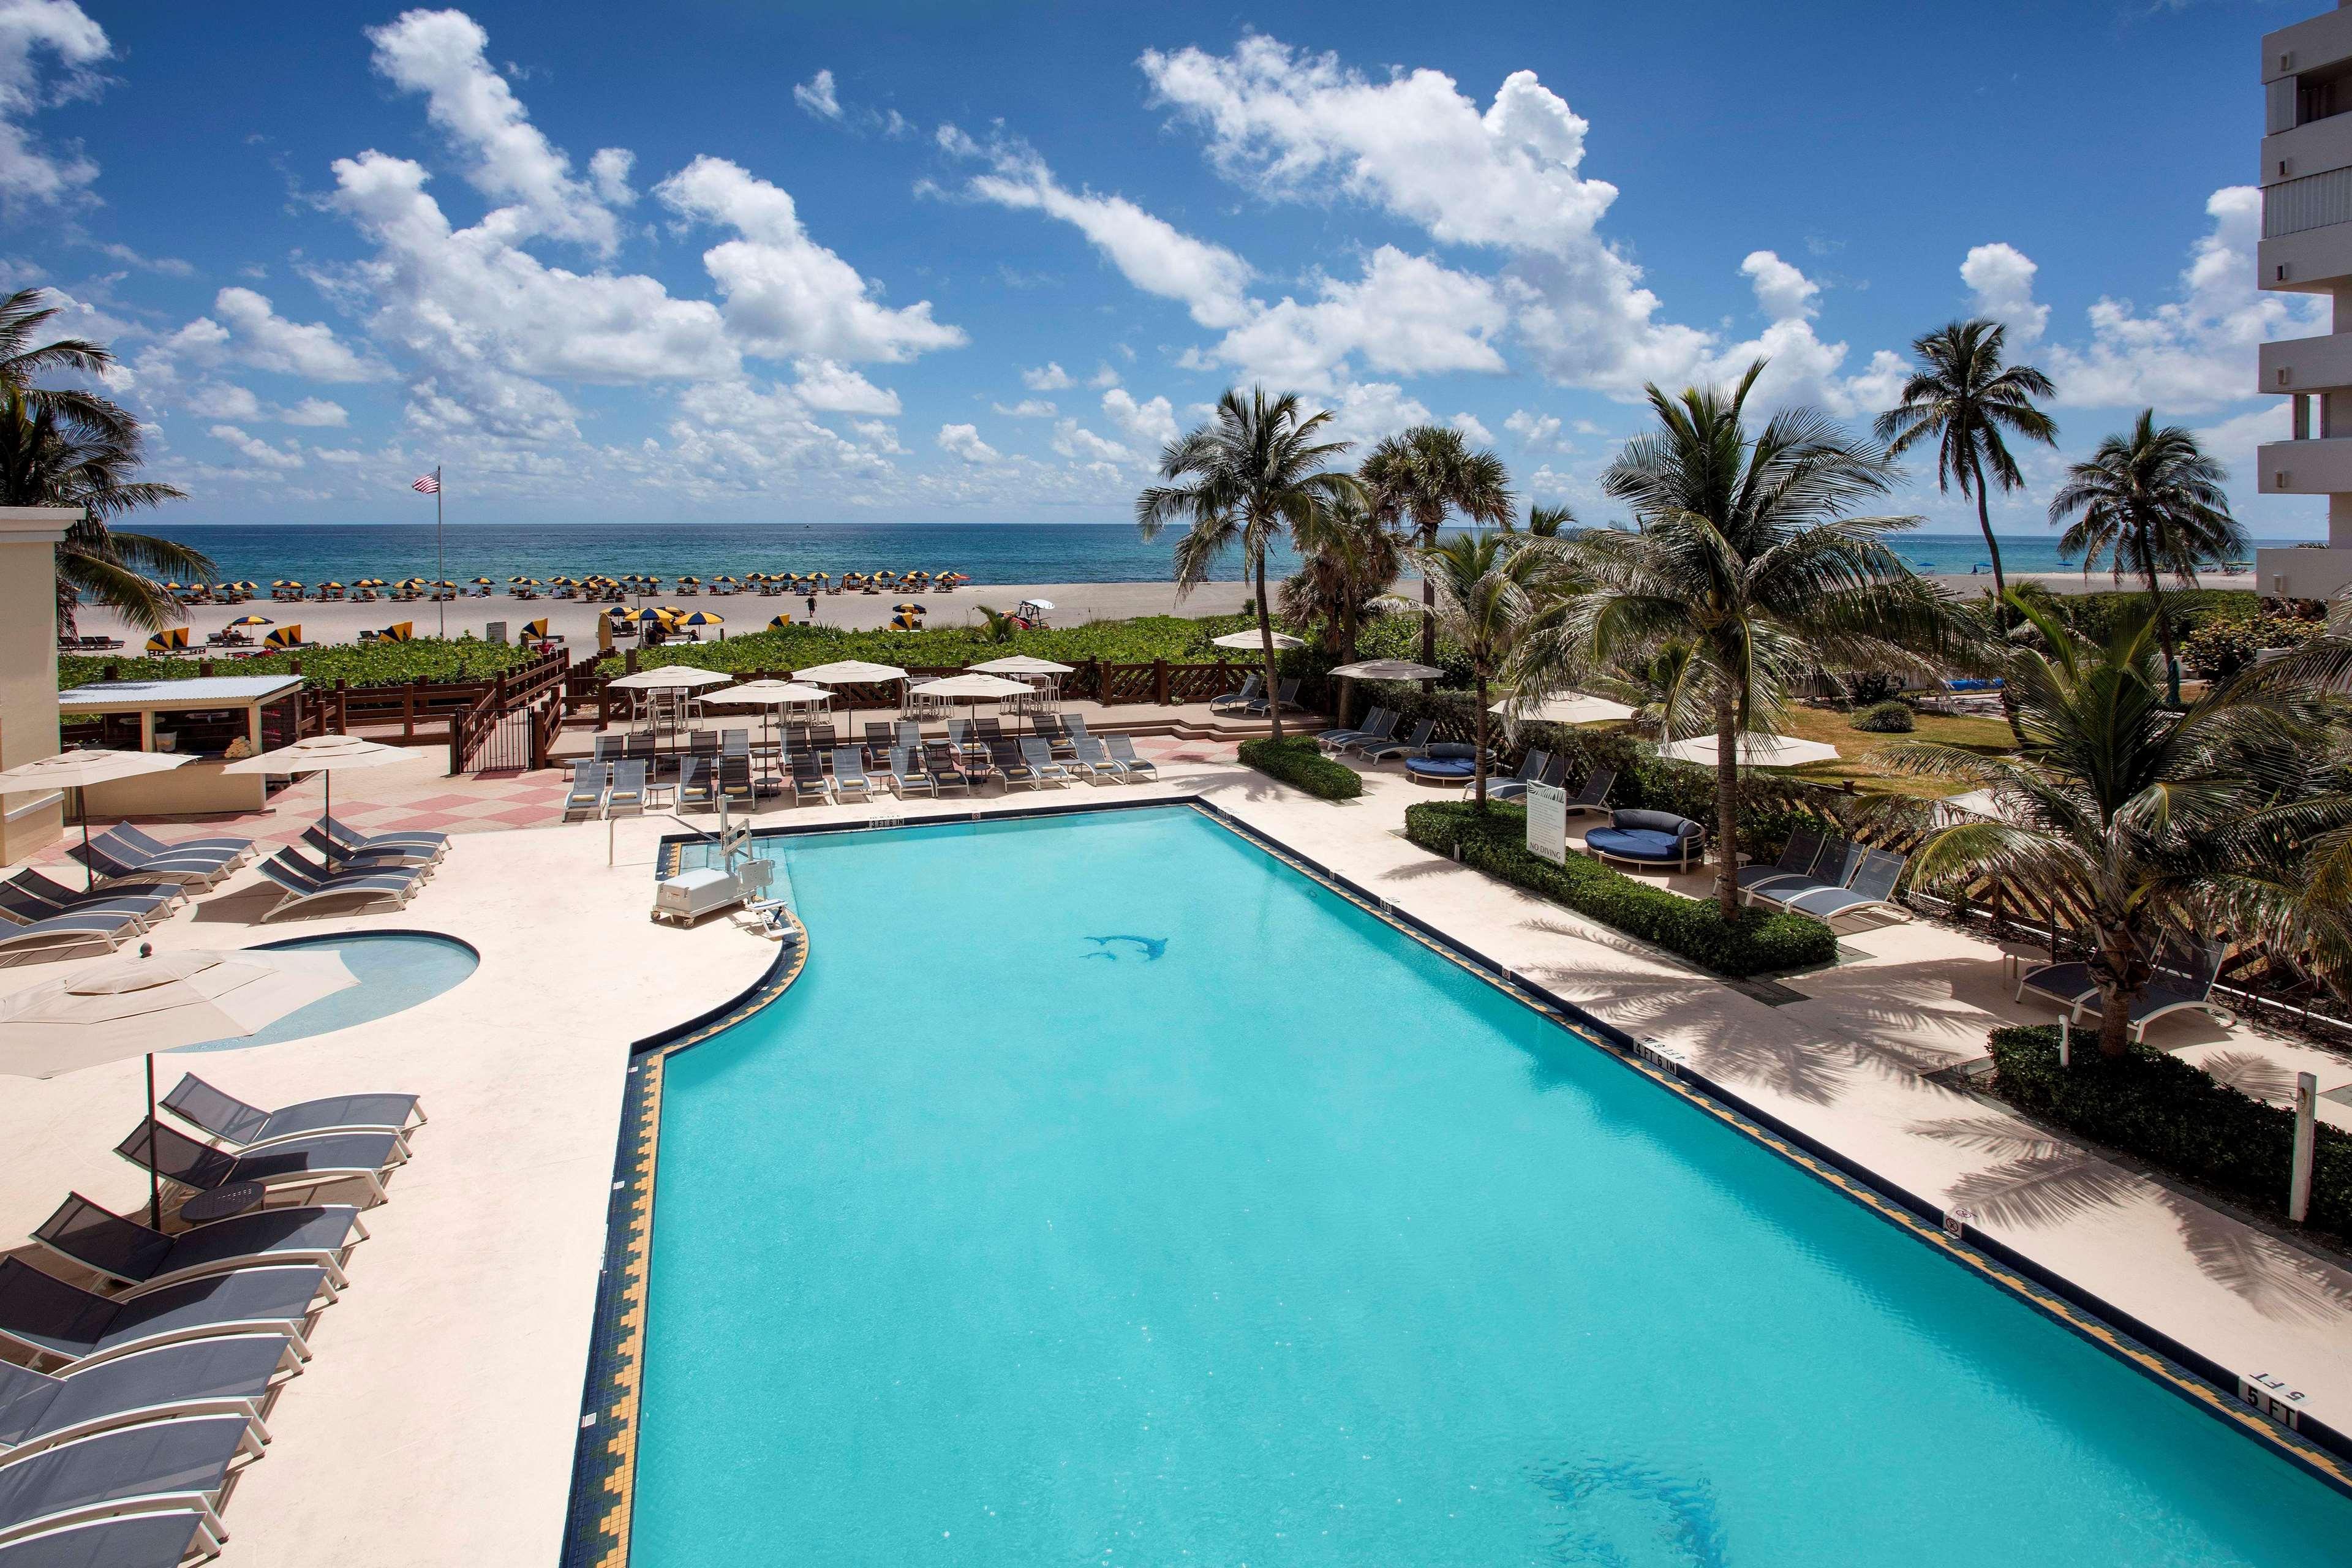 Hilton Singer Island Oceanfront/Palm Beaches Resort image 46